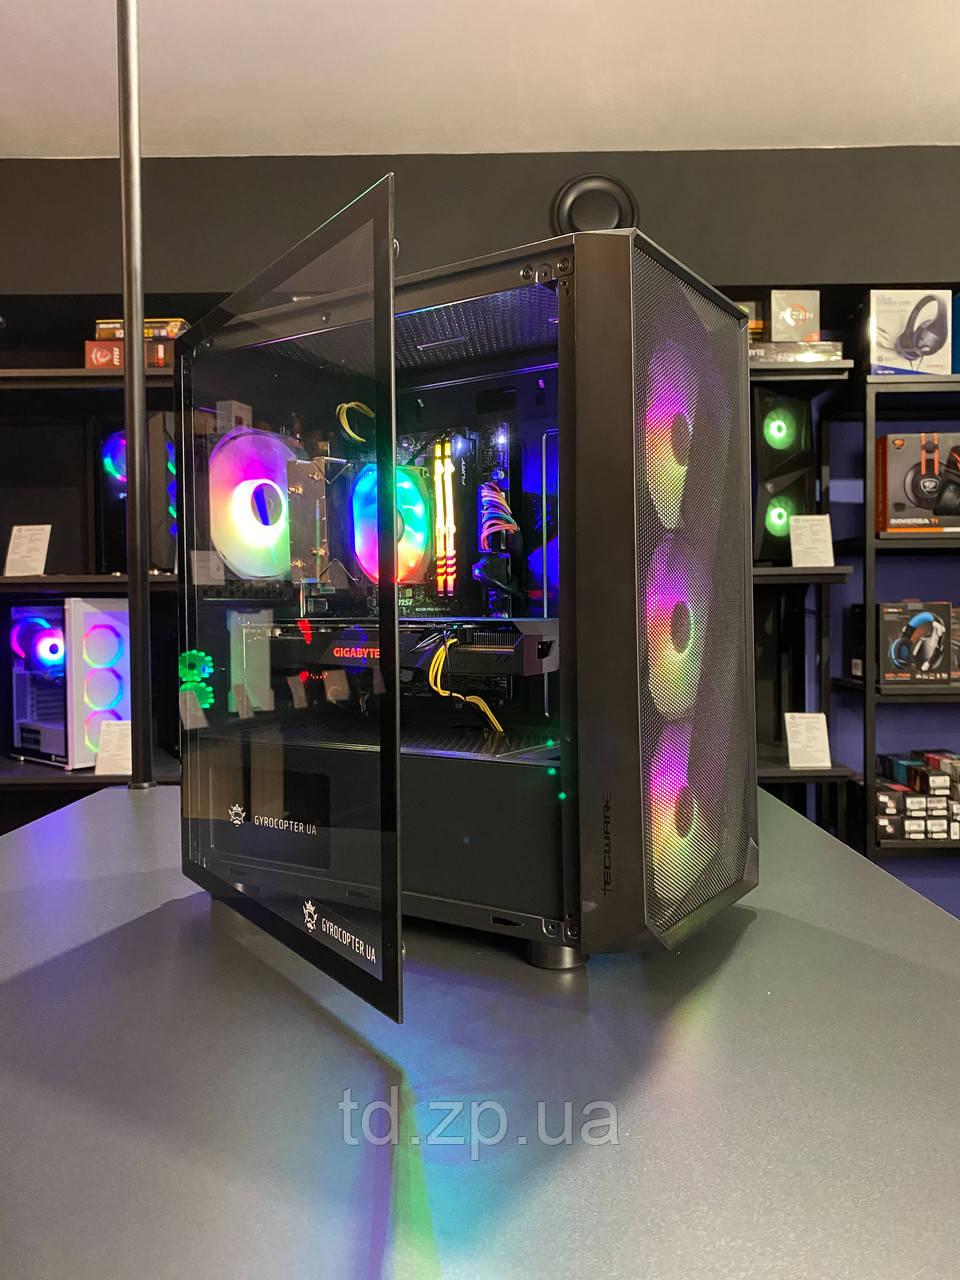 Игровой компьютер Intel Core i5-10400f + RTX 3060Ti 8Gb + RAM 16Gb + HDD 1000Gb + SSD 240Gb